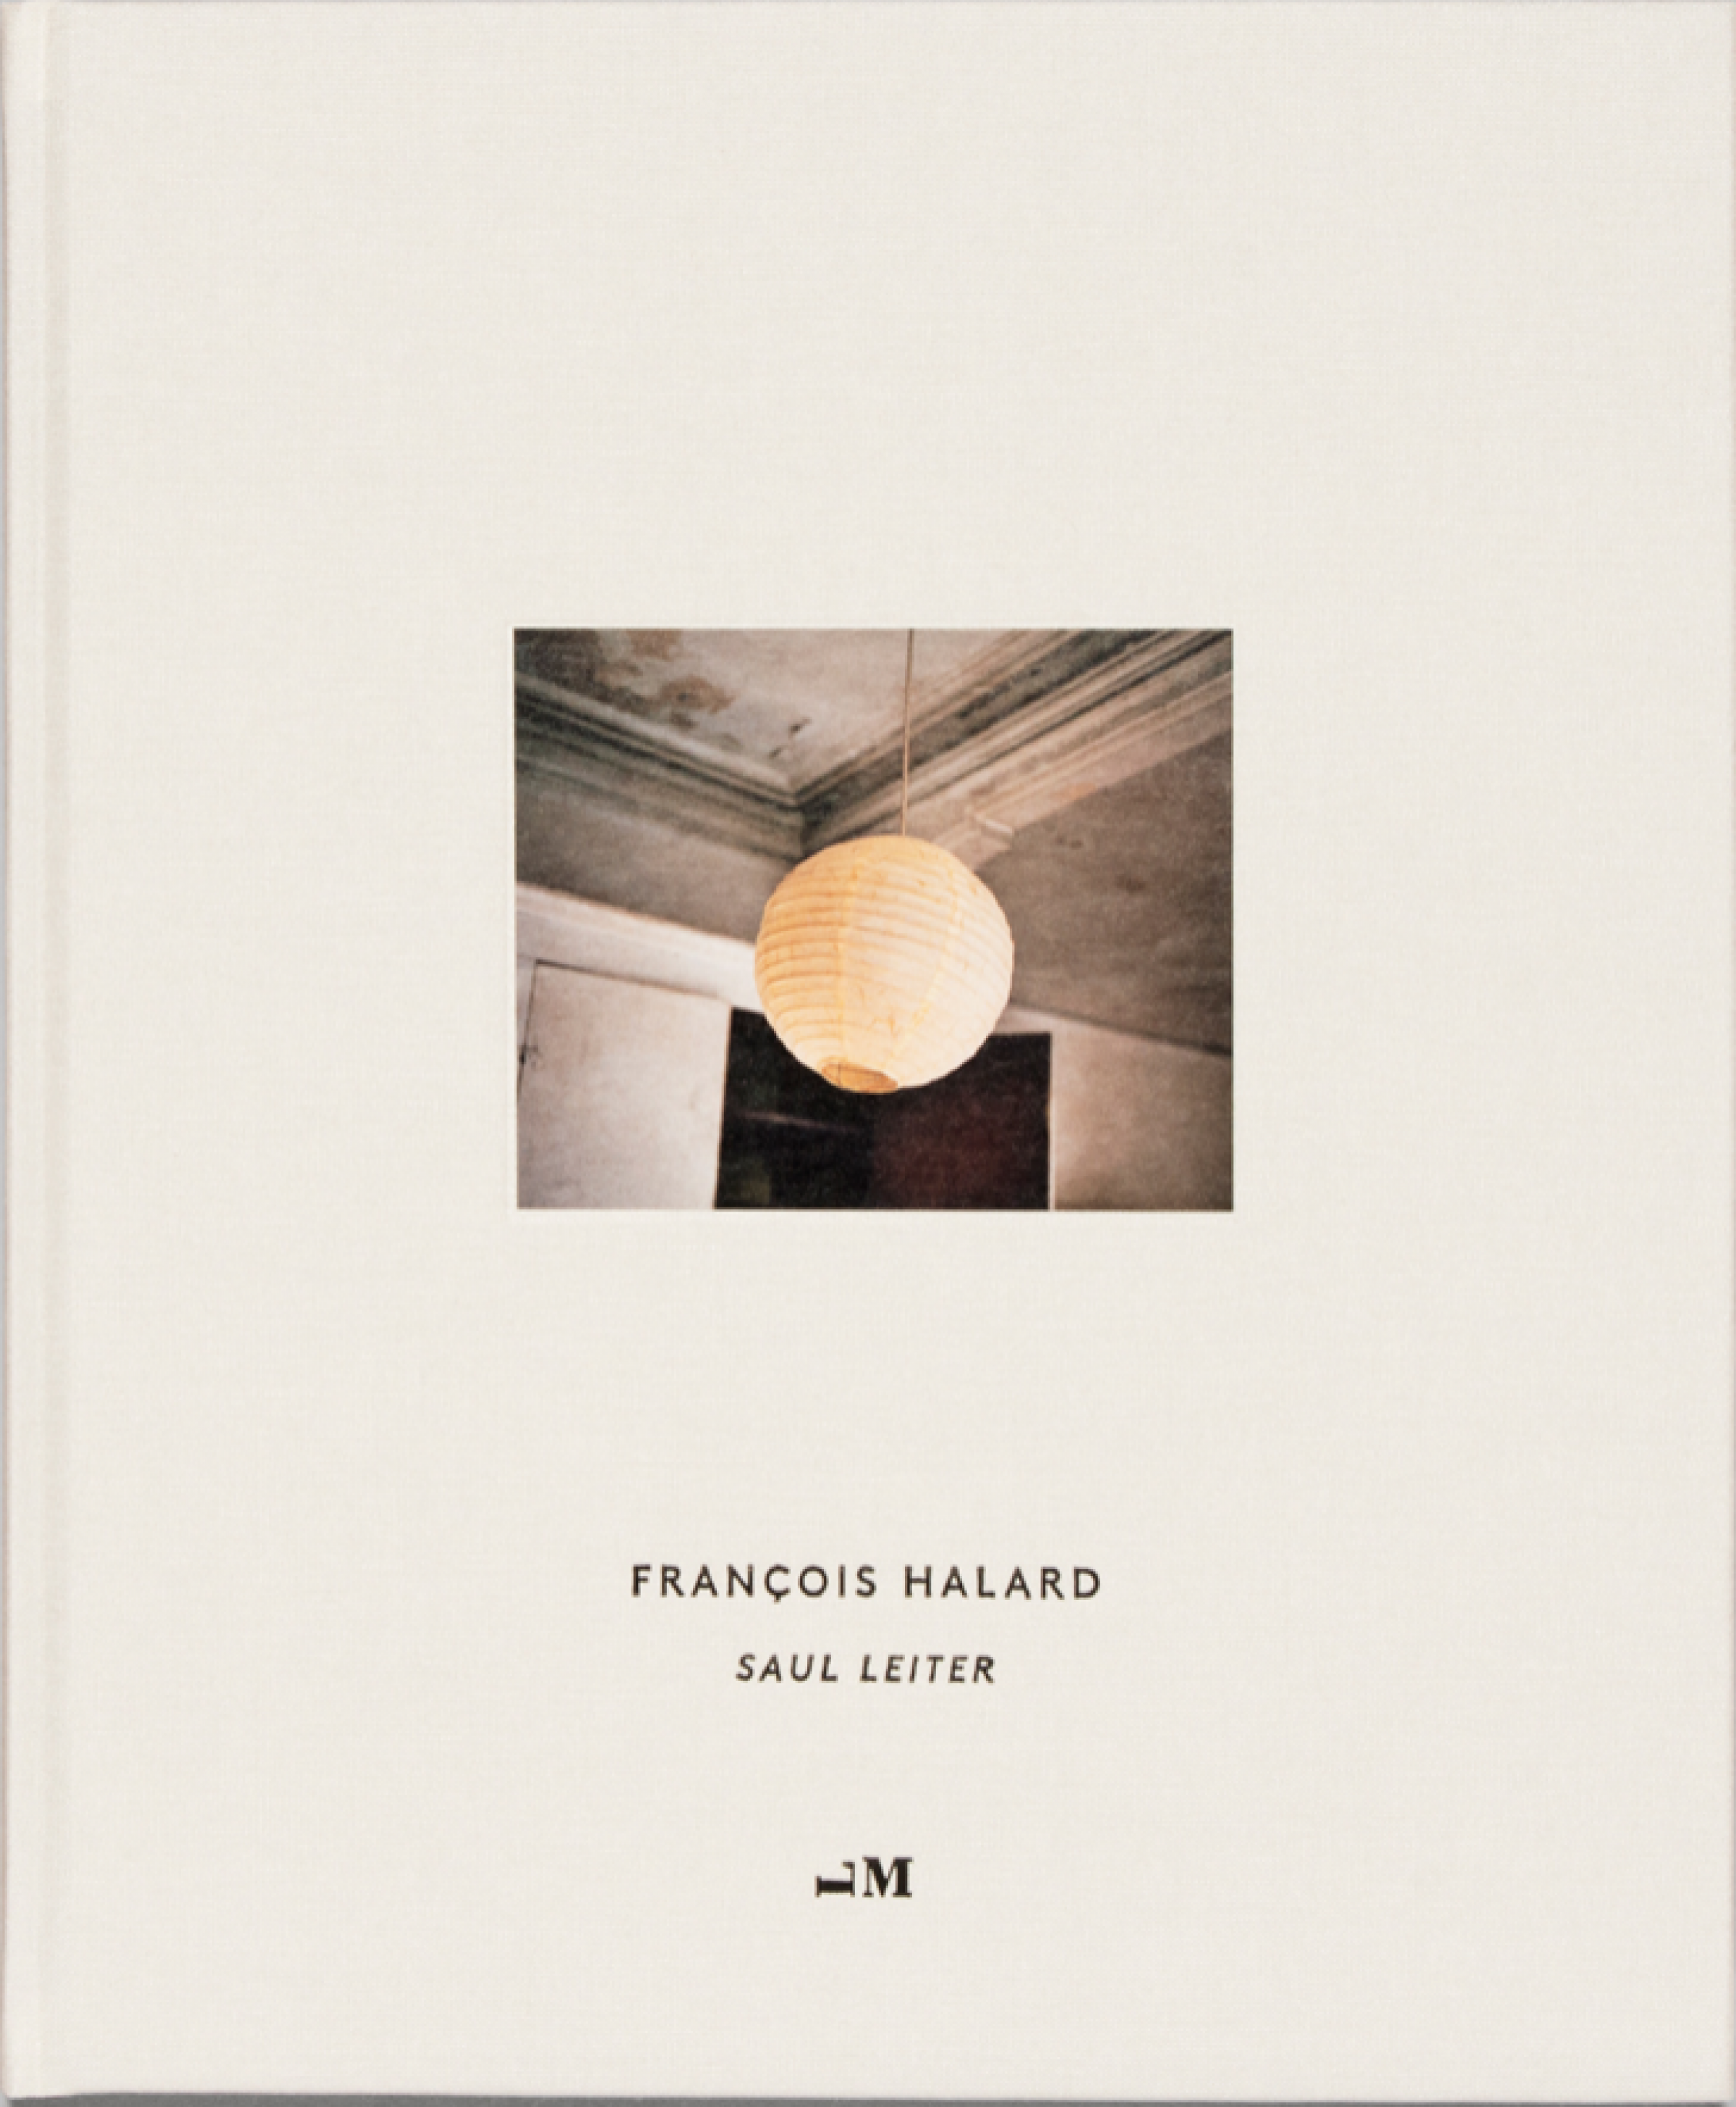 François Halard: Saul Leiter